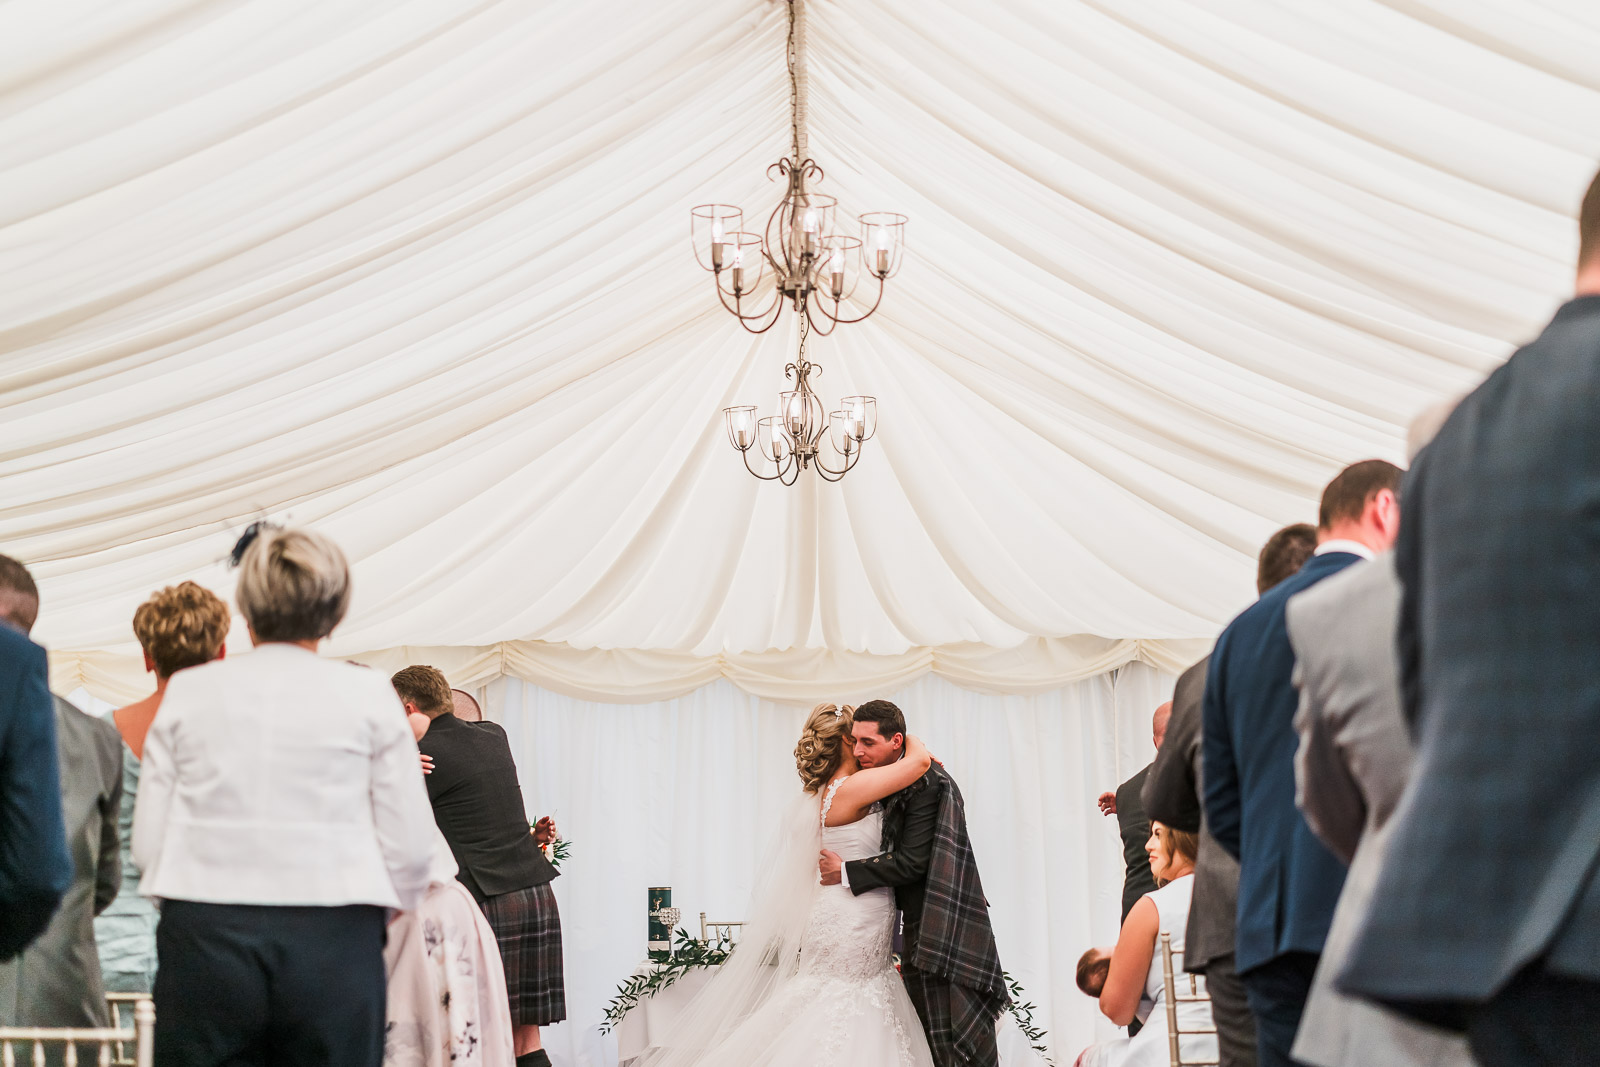 cornhill_castle_wedding_biggar_dearlyphotography (152 of 448).jpg